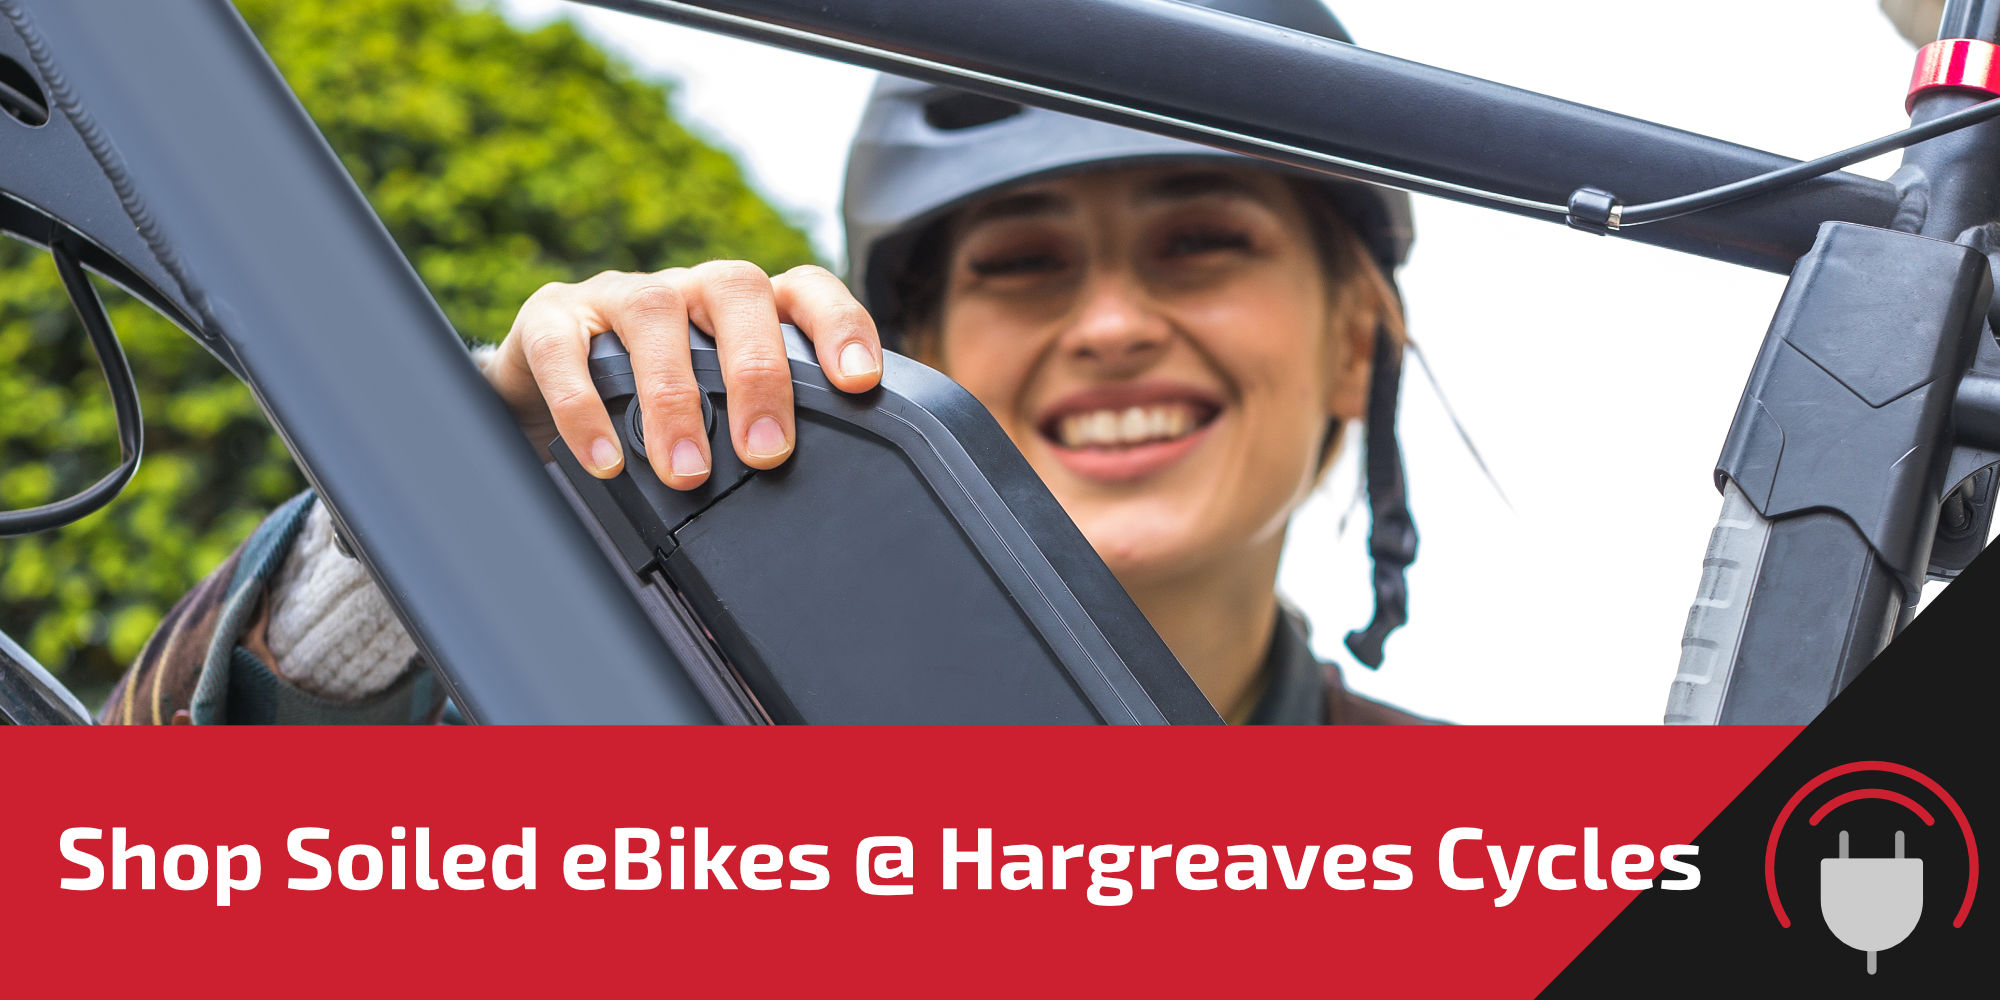 eBikes At Hargreaves Cycles